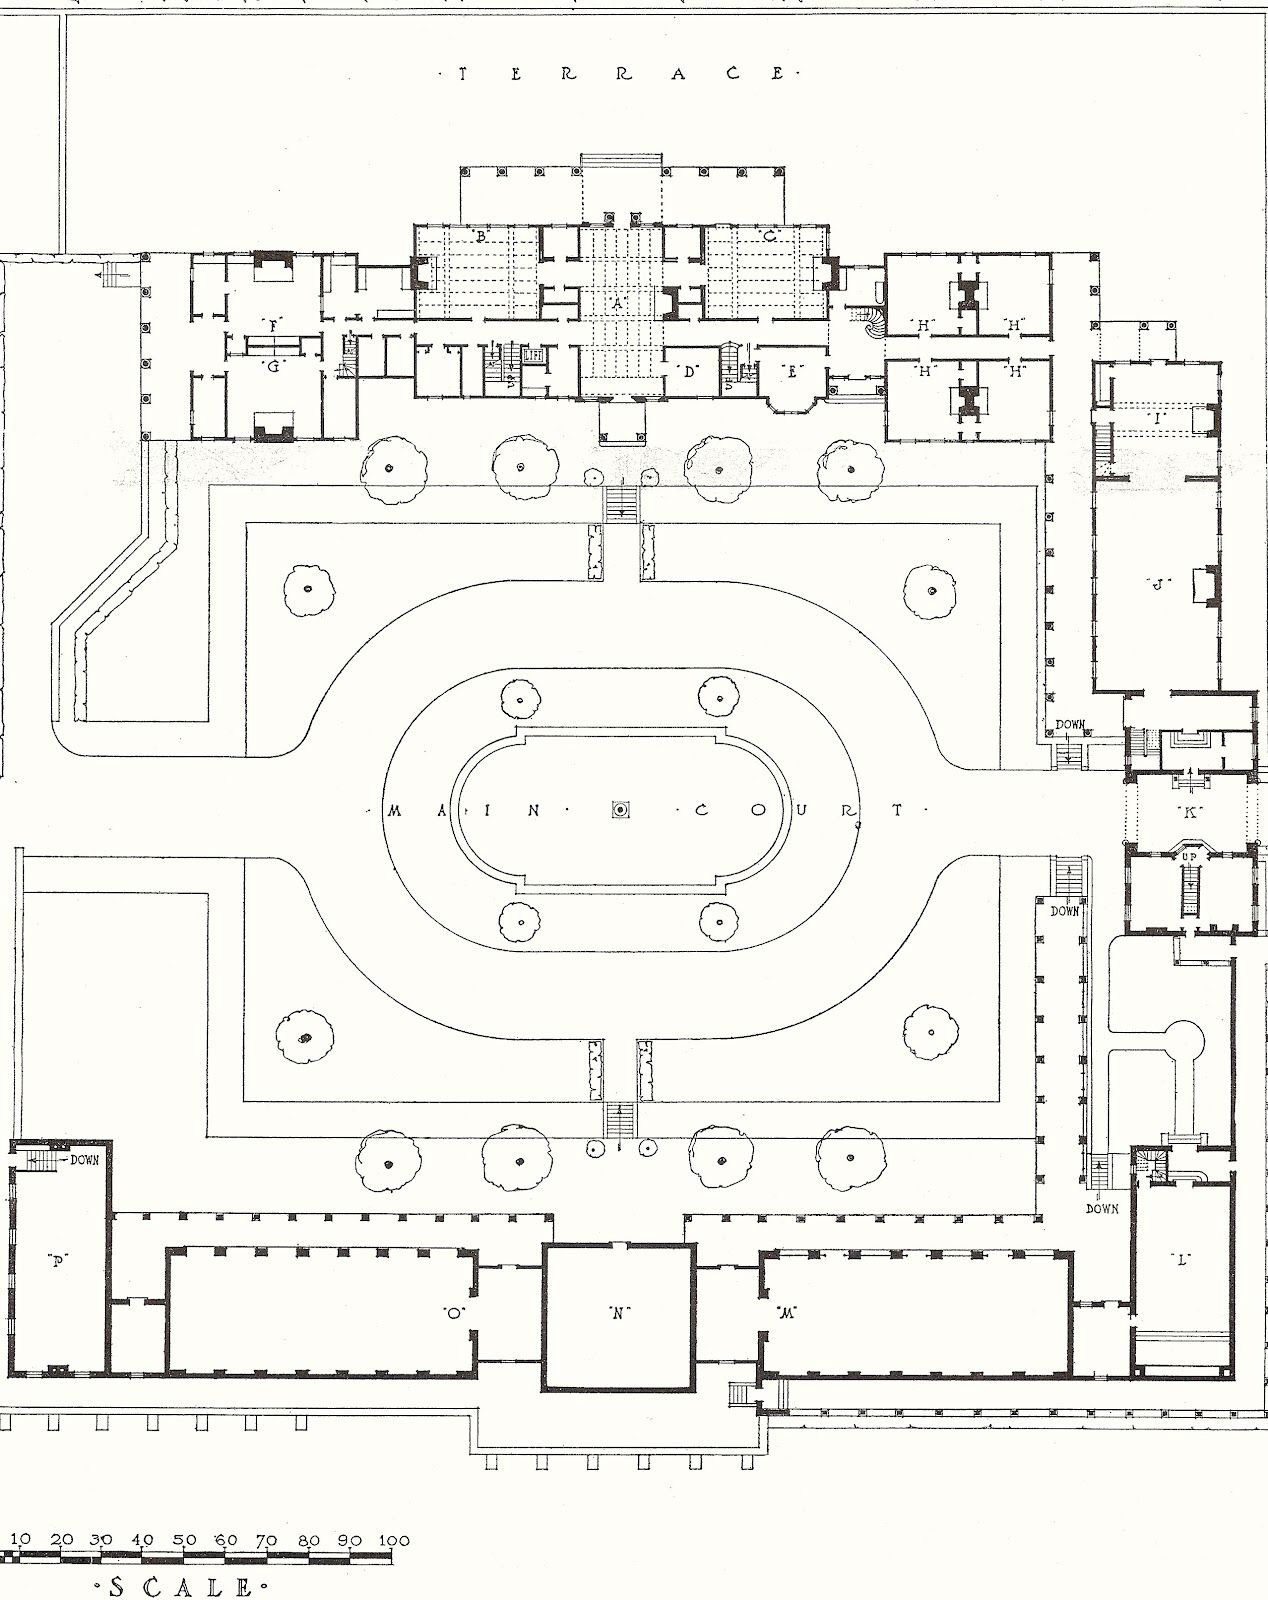 The Breakers Newport Floor Plan Wheatley 1st Floor Gilded Age Mansions Pinterest